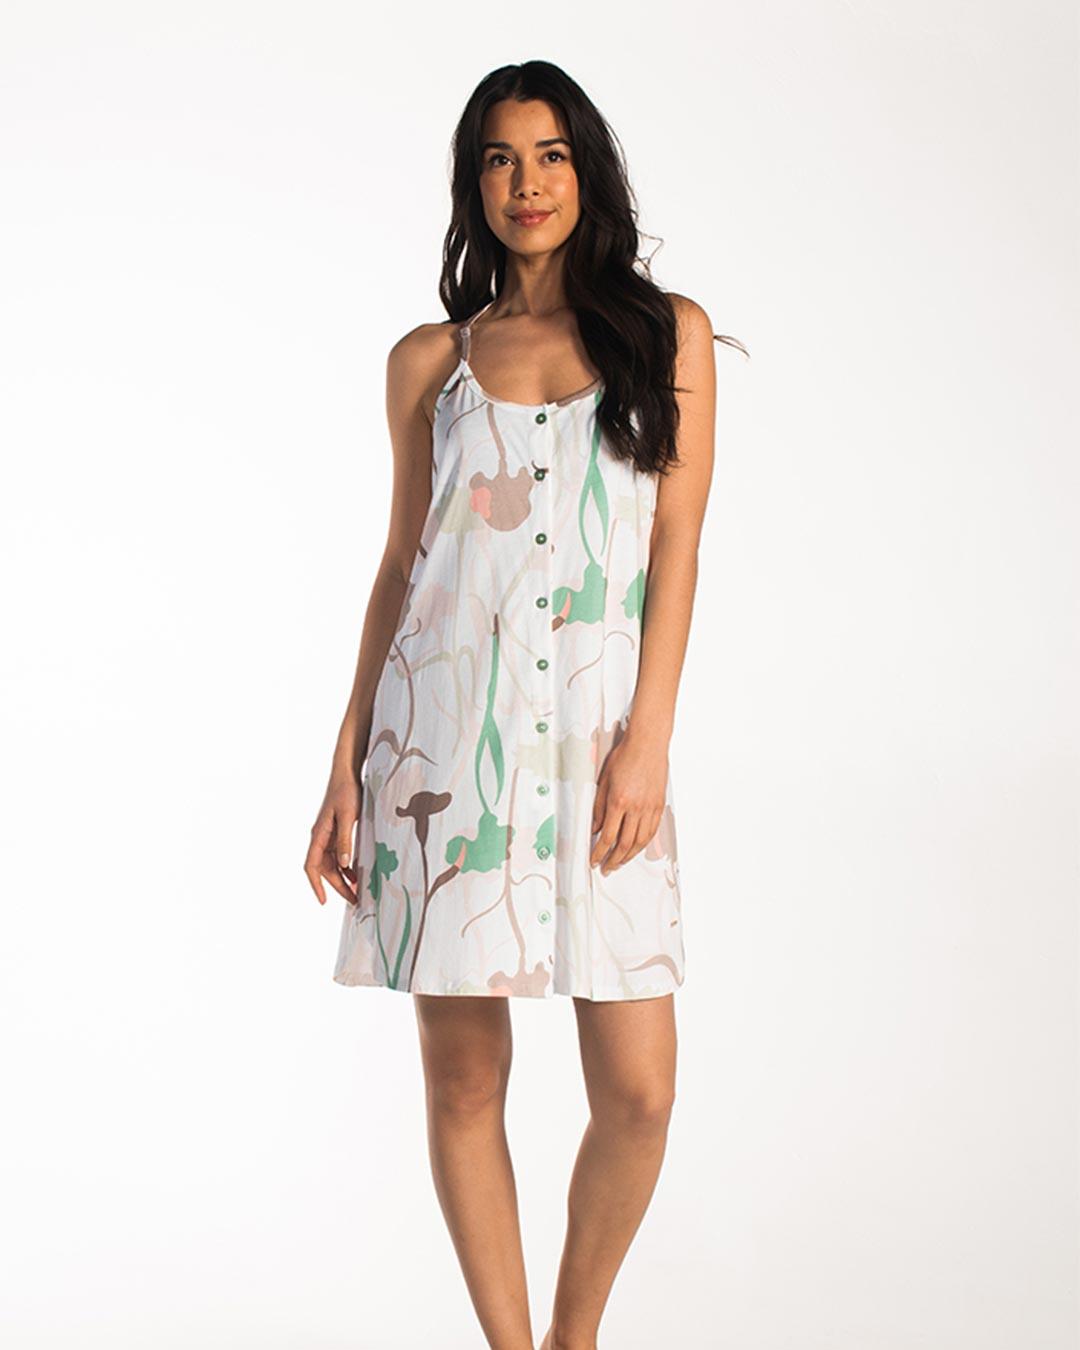 cyell-netherlands-spring-carnation-singlet-dress-front-dianes-lingerie-vancouver-1080x1350